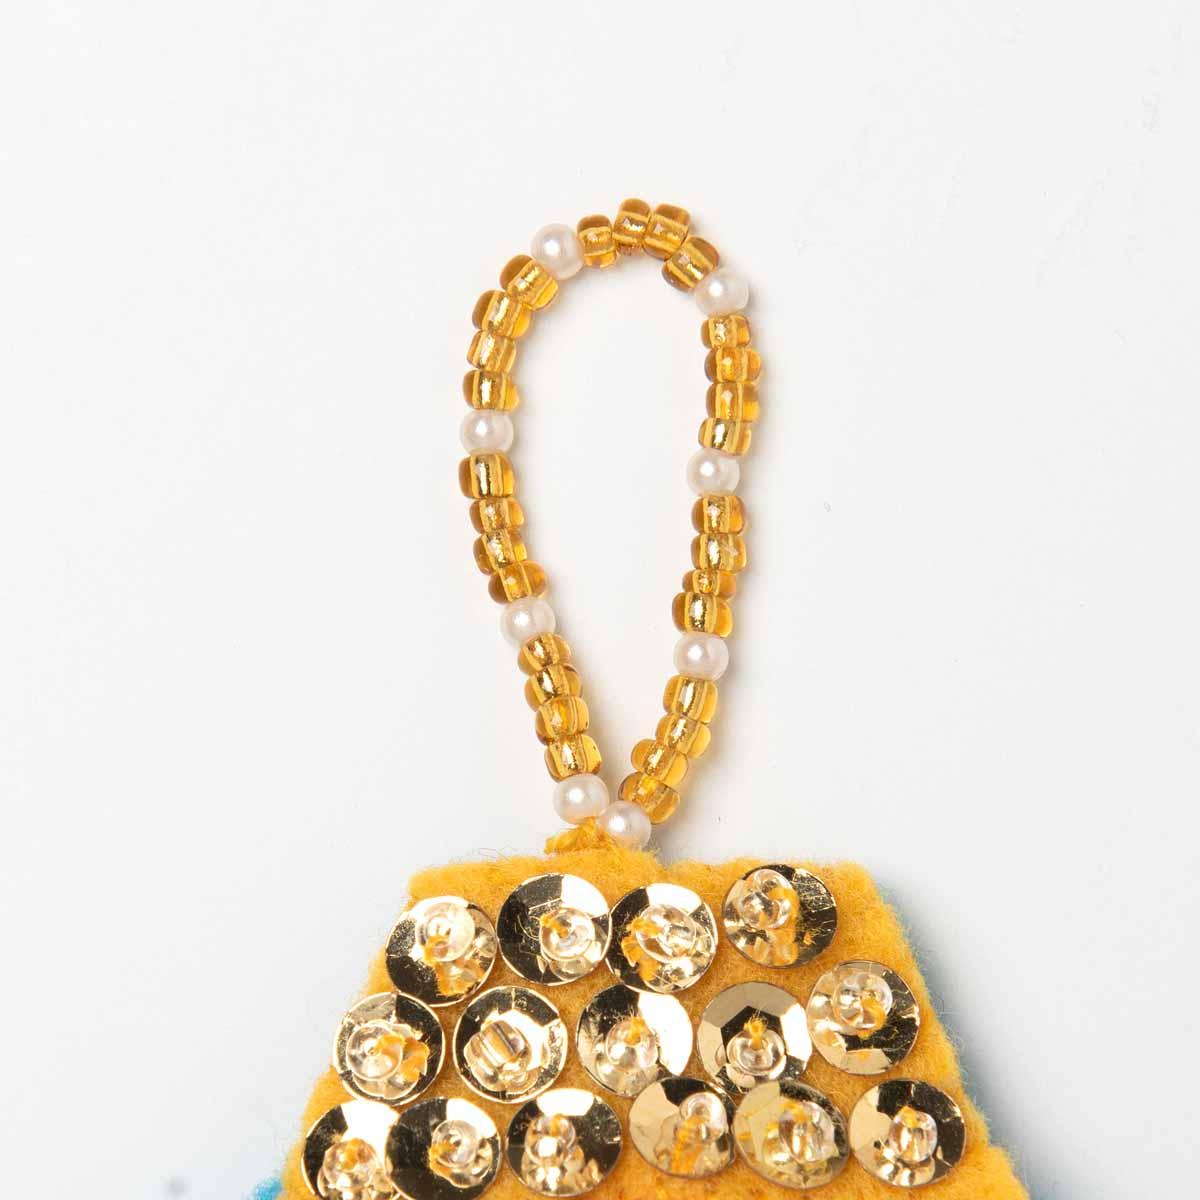 Bucilla ® Seasonal - Felt - Ornament Kits - Hallmark - Pretty Tree Trimmers - 89265E